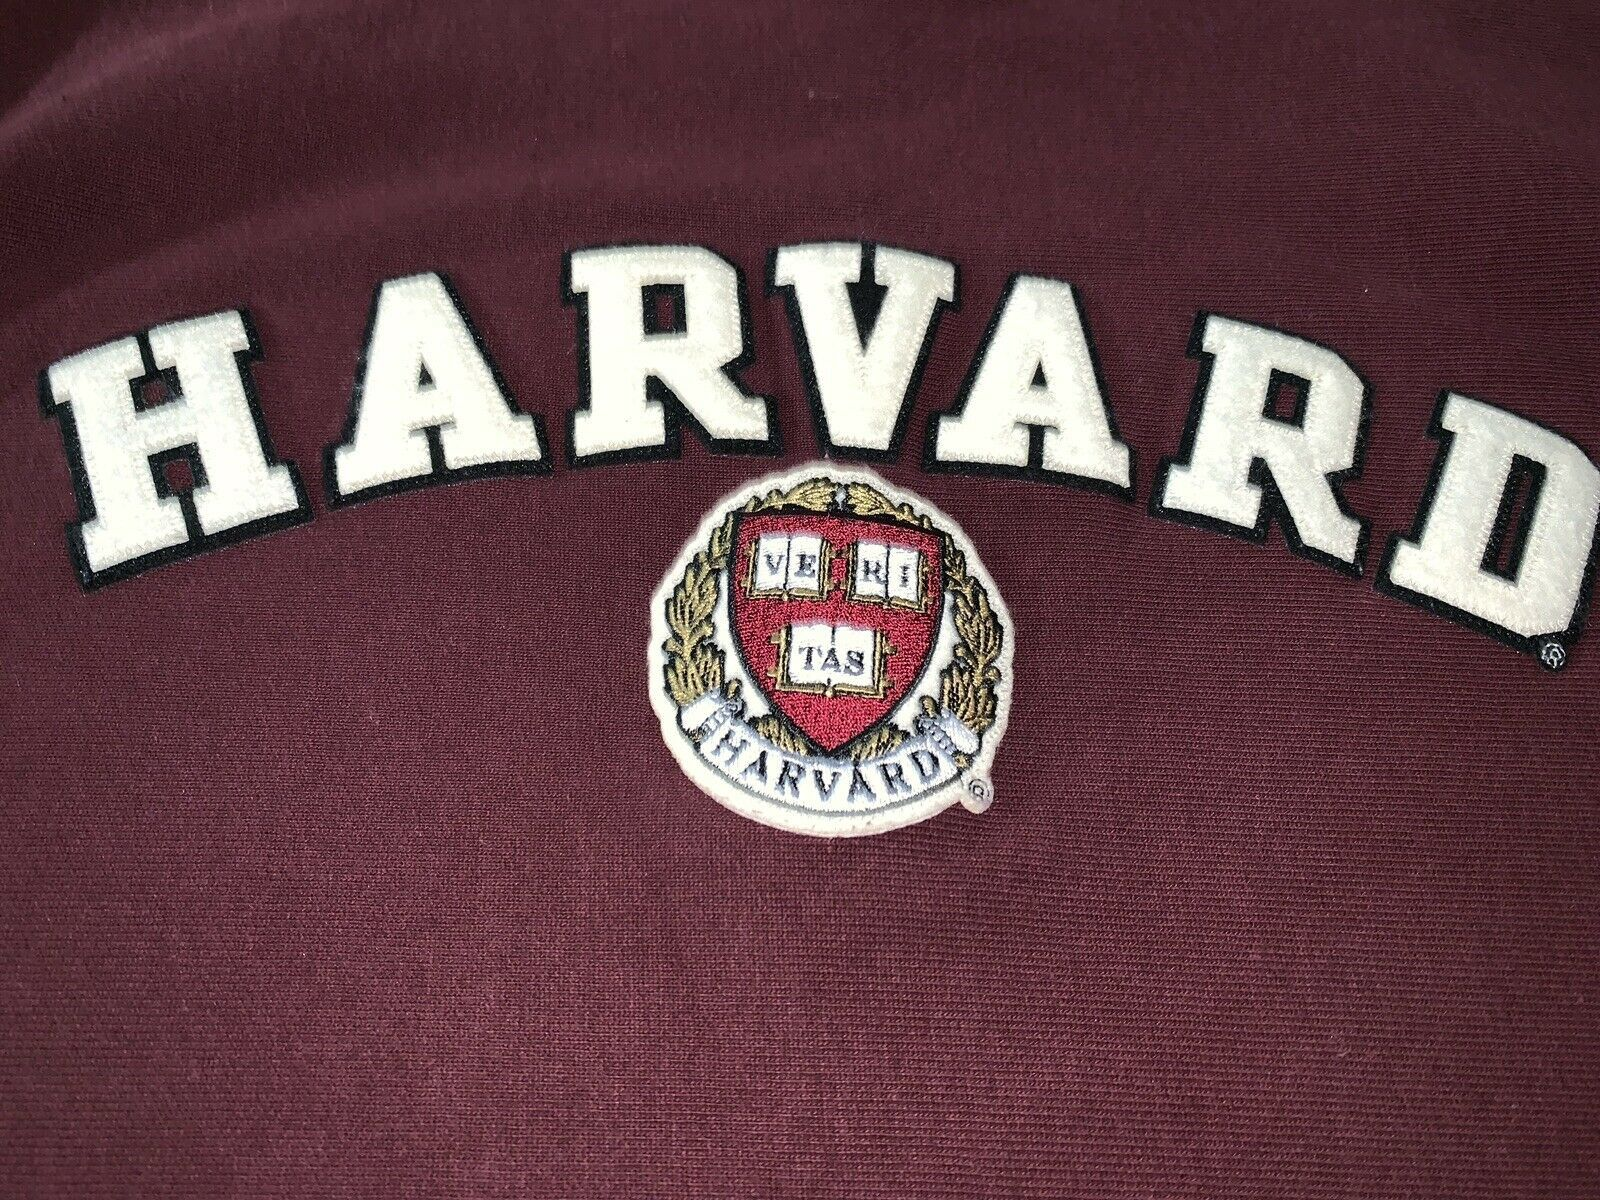 Champion Reverse Weave Sweatshirt Harvard Men's Size M Burgundy L/S Exc Cond image 2